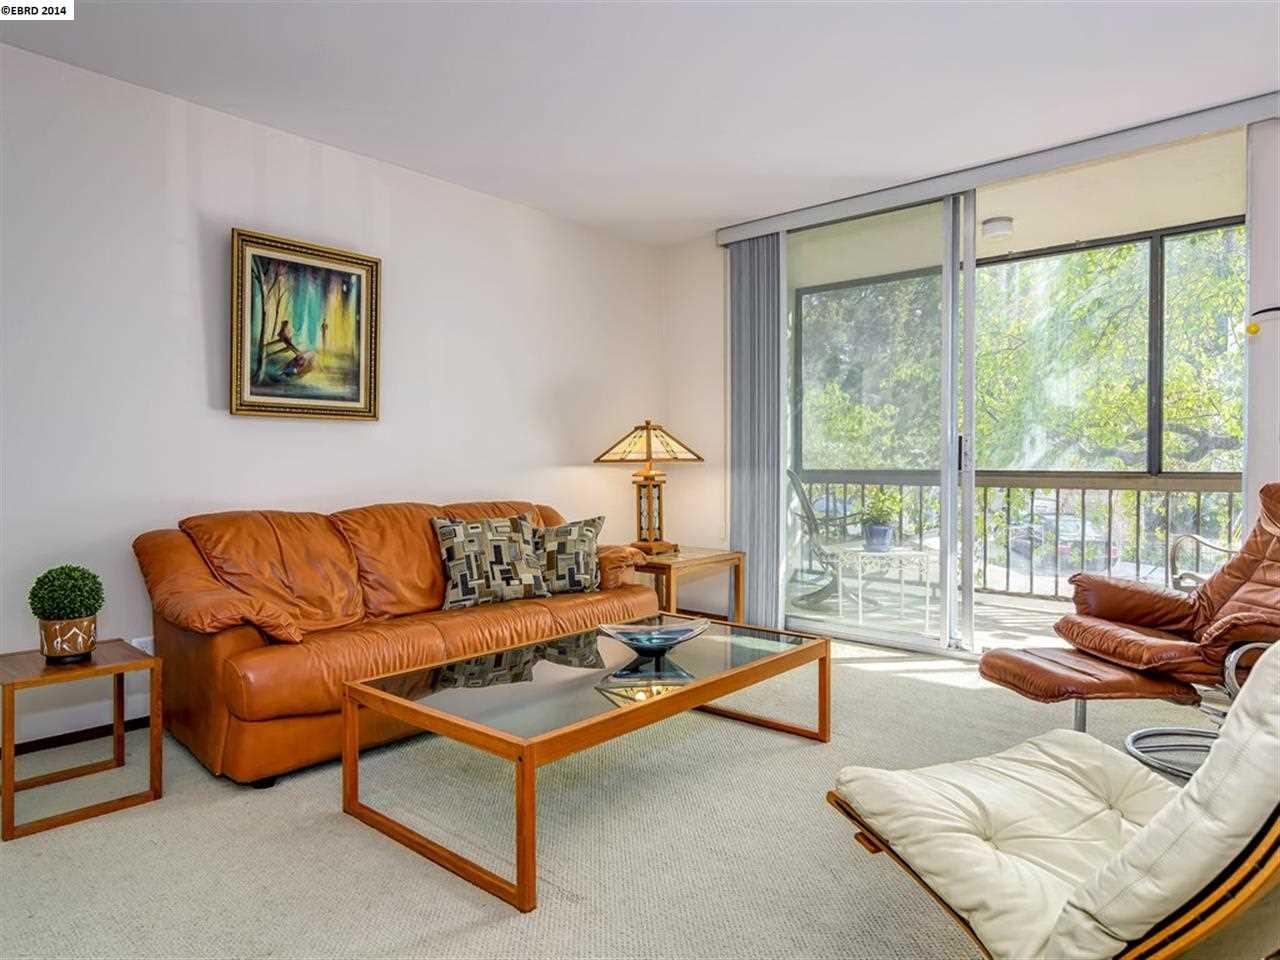 Casa Unifamiliar por un Venta en 250 Whitmore Street Oakland, California 94611 Estados Unidos